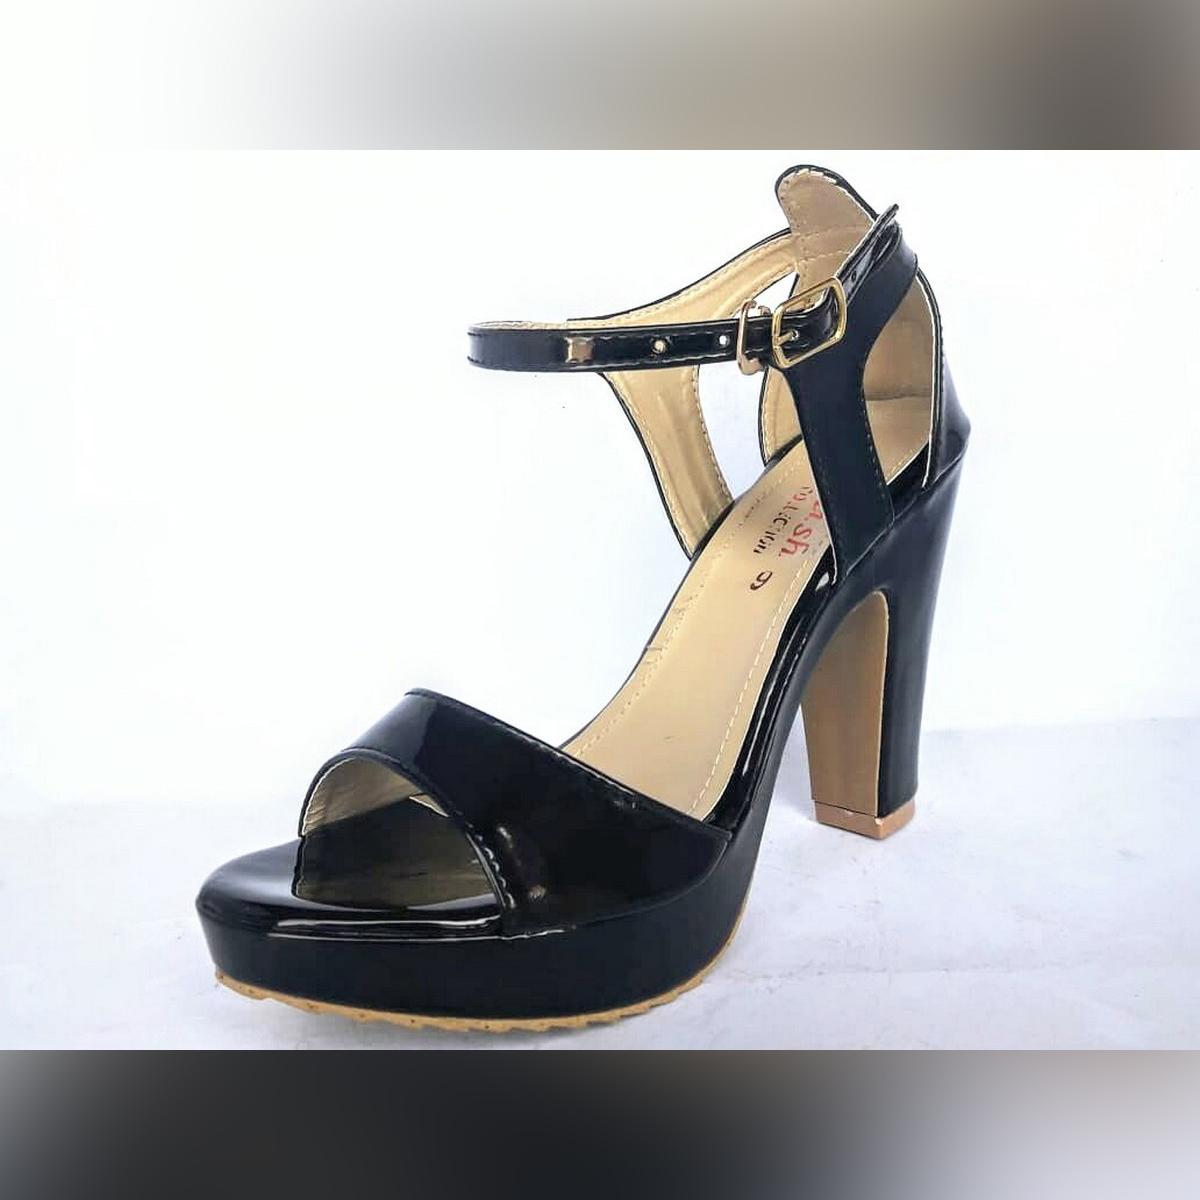 Stylish Sps-91 Platform Chunky High Heels Sandals For Women